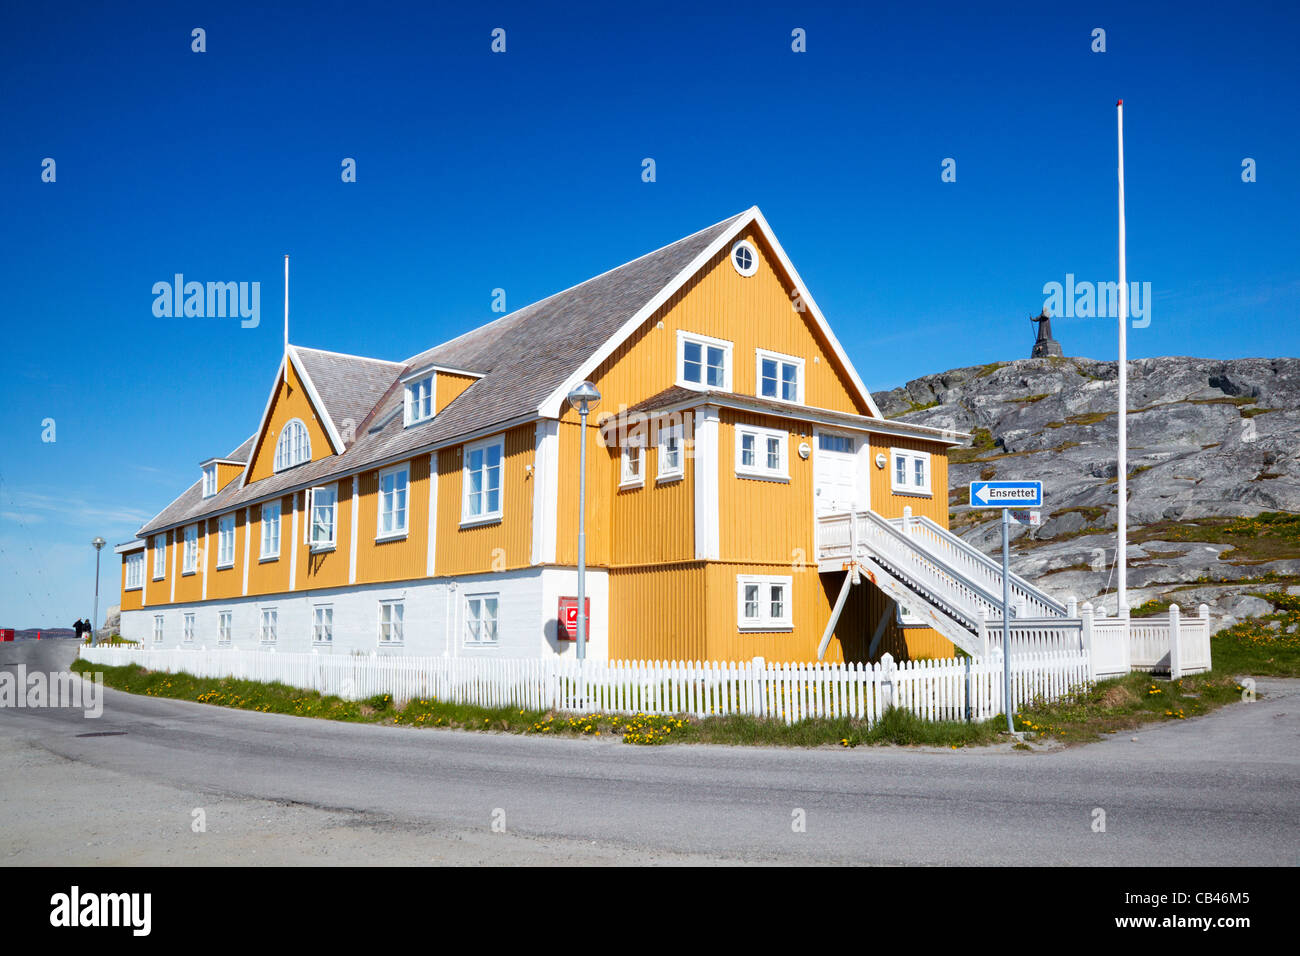 Det Gamle Sygehus (The Old Hospital) Nuuk, Greenland Stock Photo